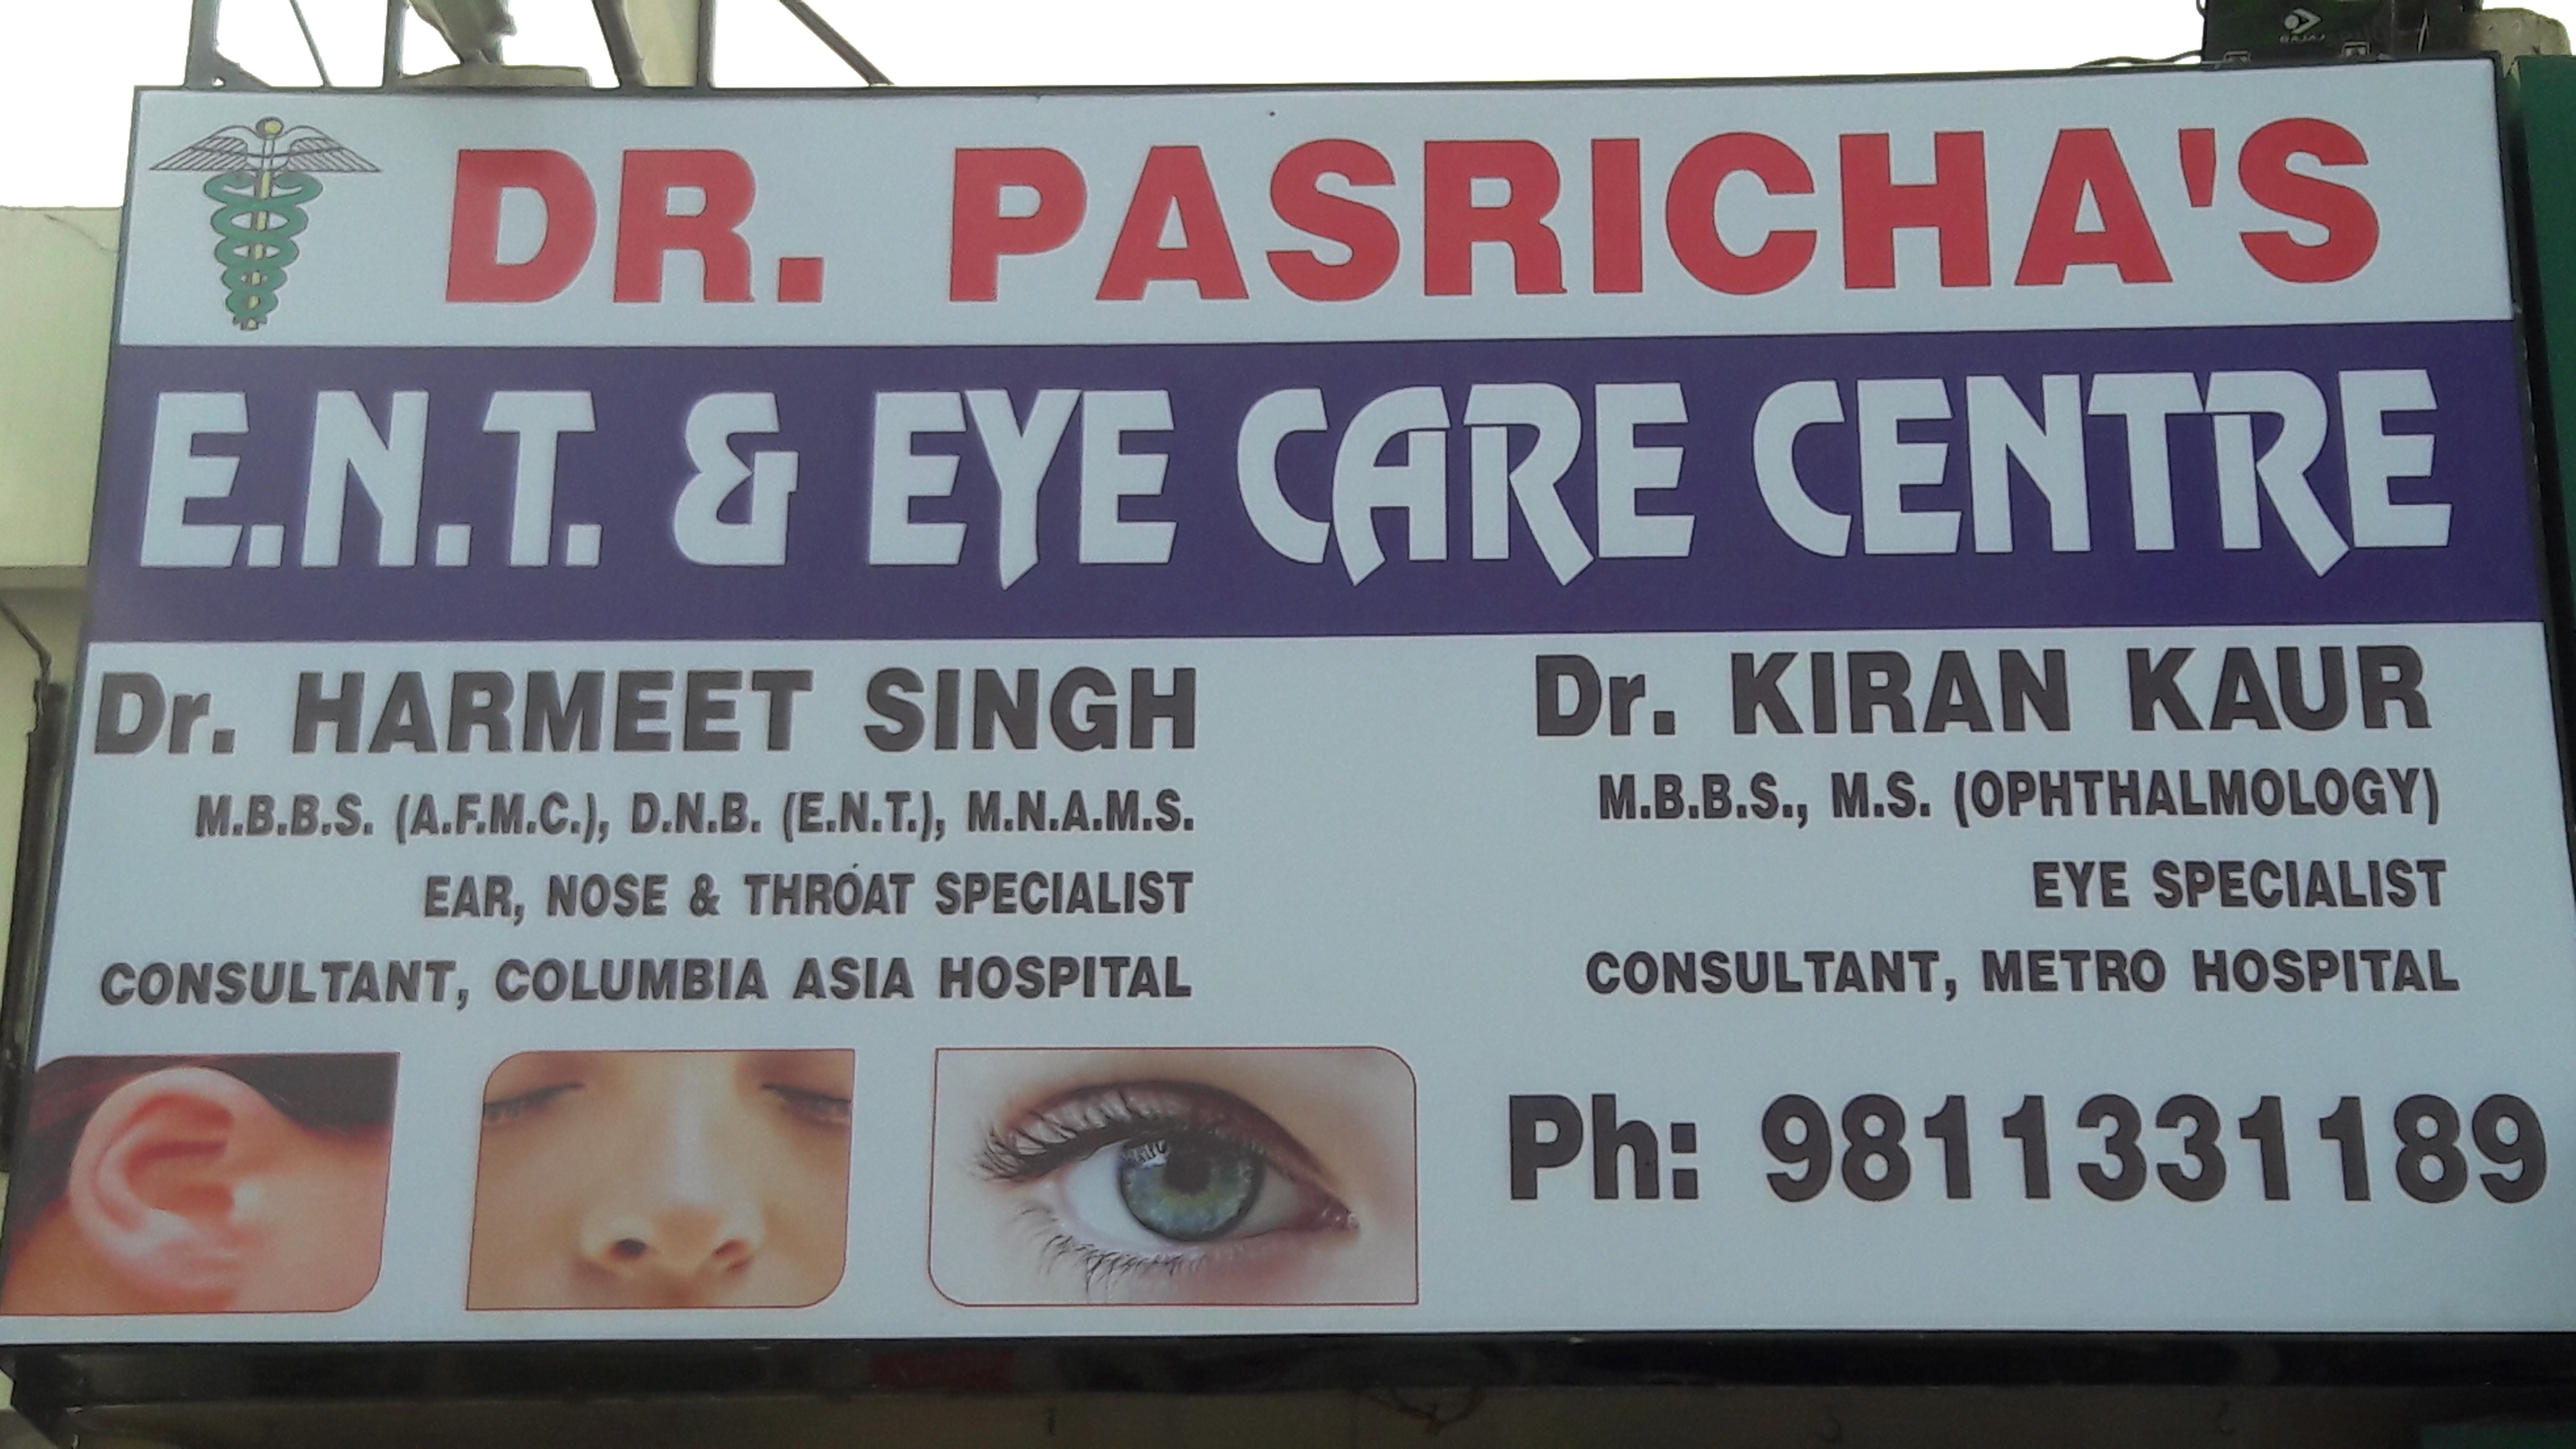 Dr. Pasricha's E.N.T. & Eye Care Centre, Gurgaon